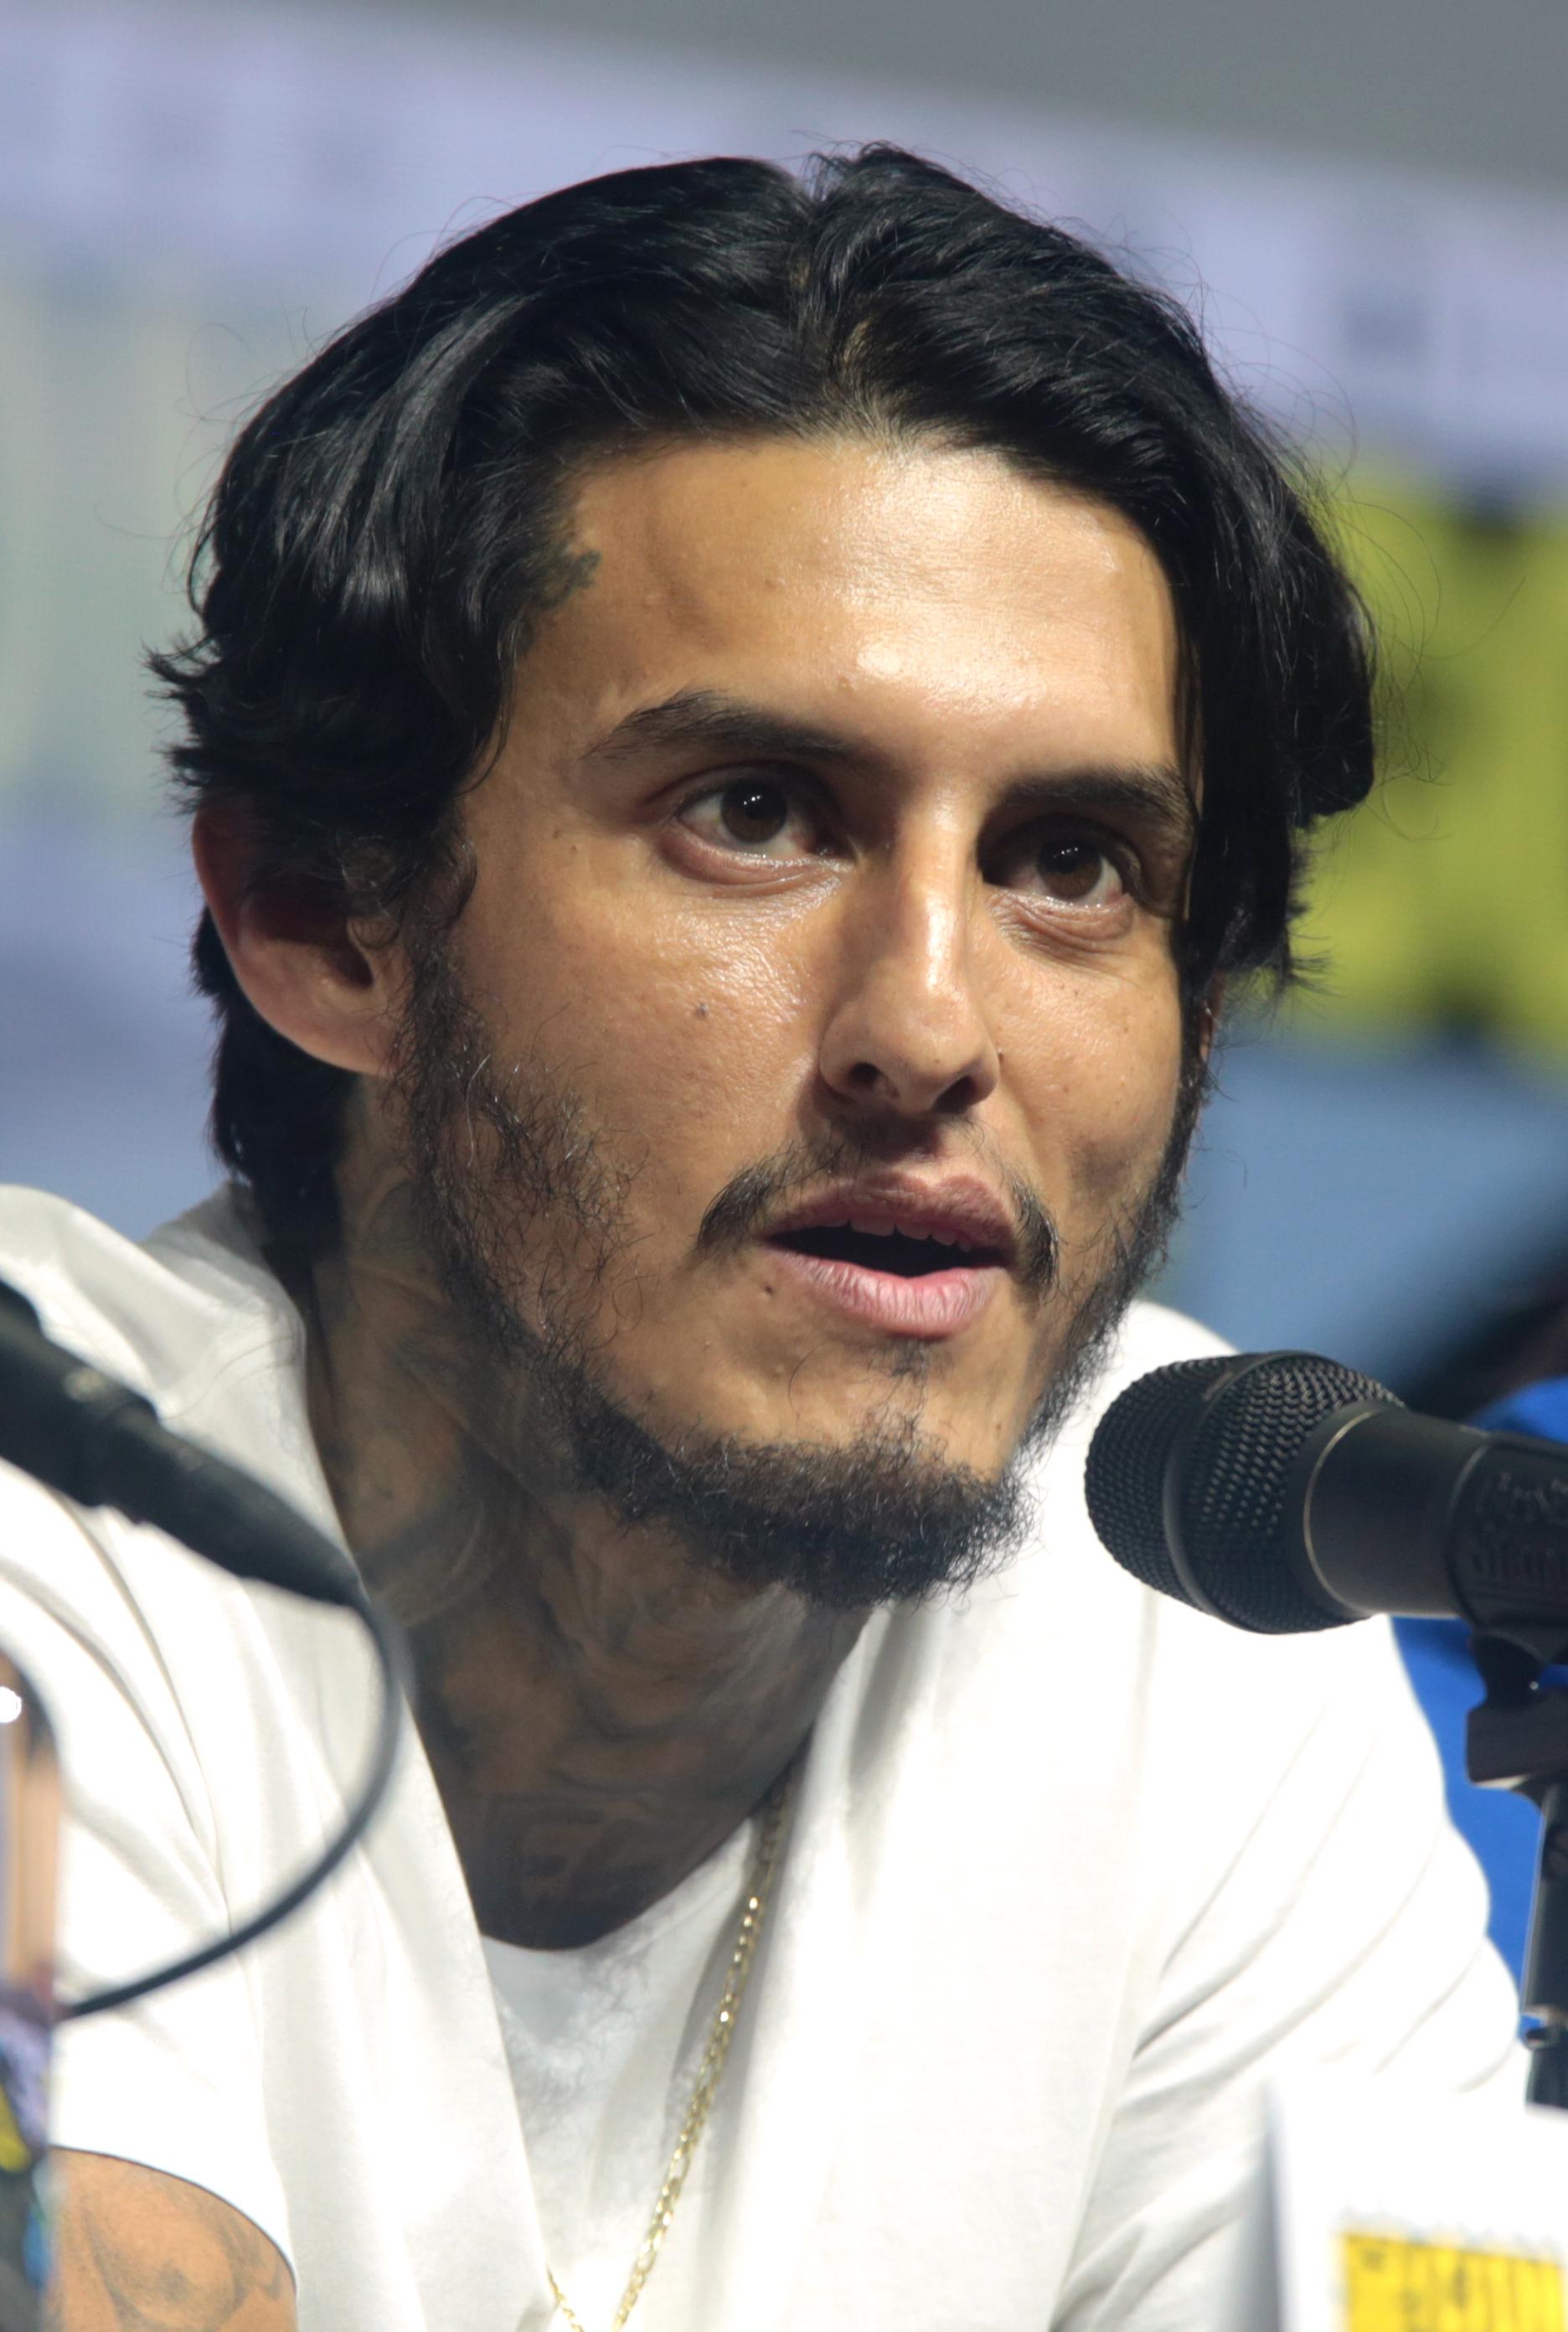 Cholo Actor